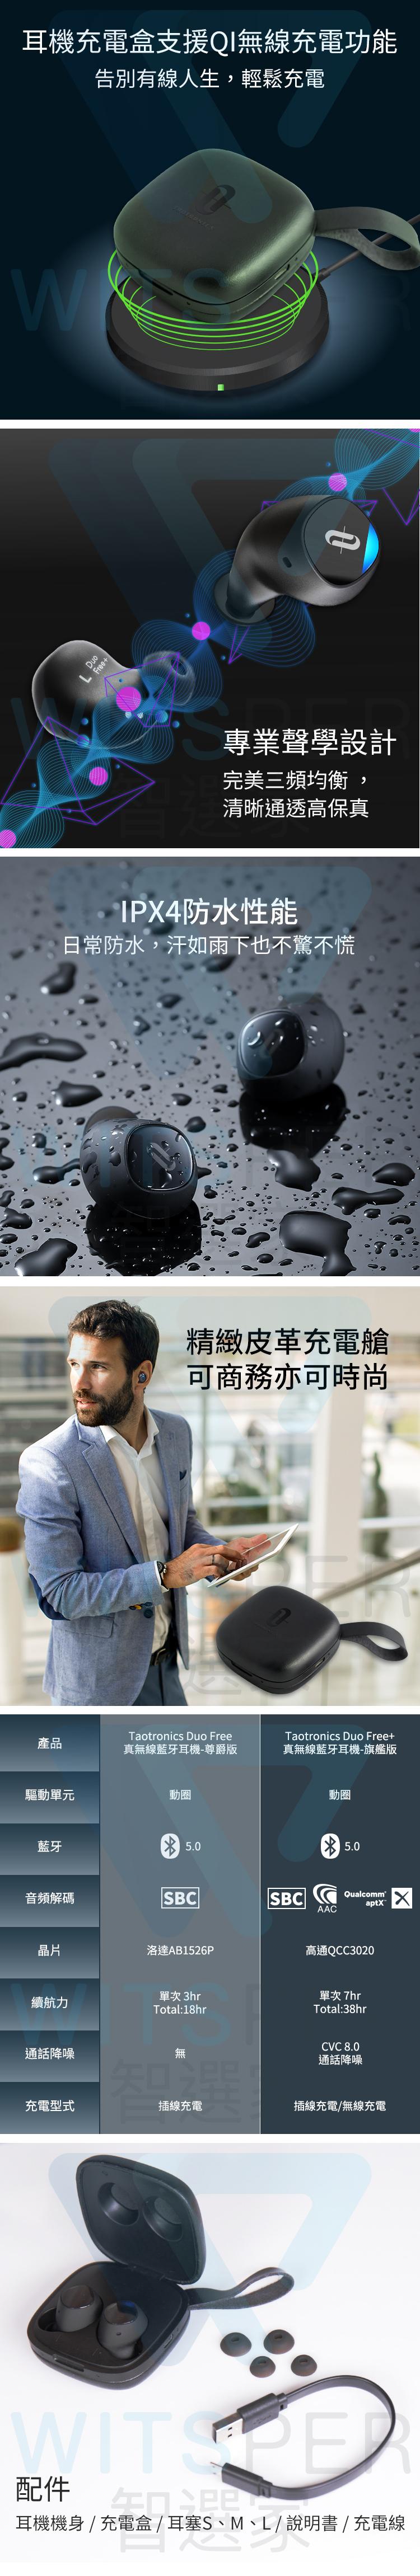 ptt, mobile01一致推薦無線耳機 - TaoTronics Duo Free+